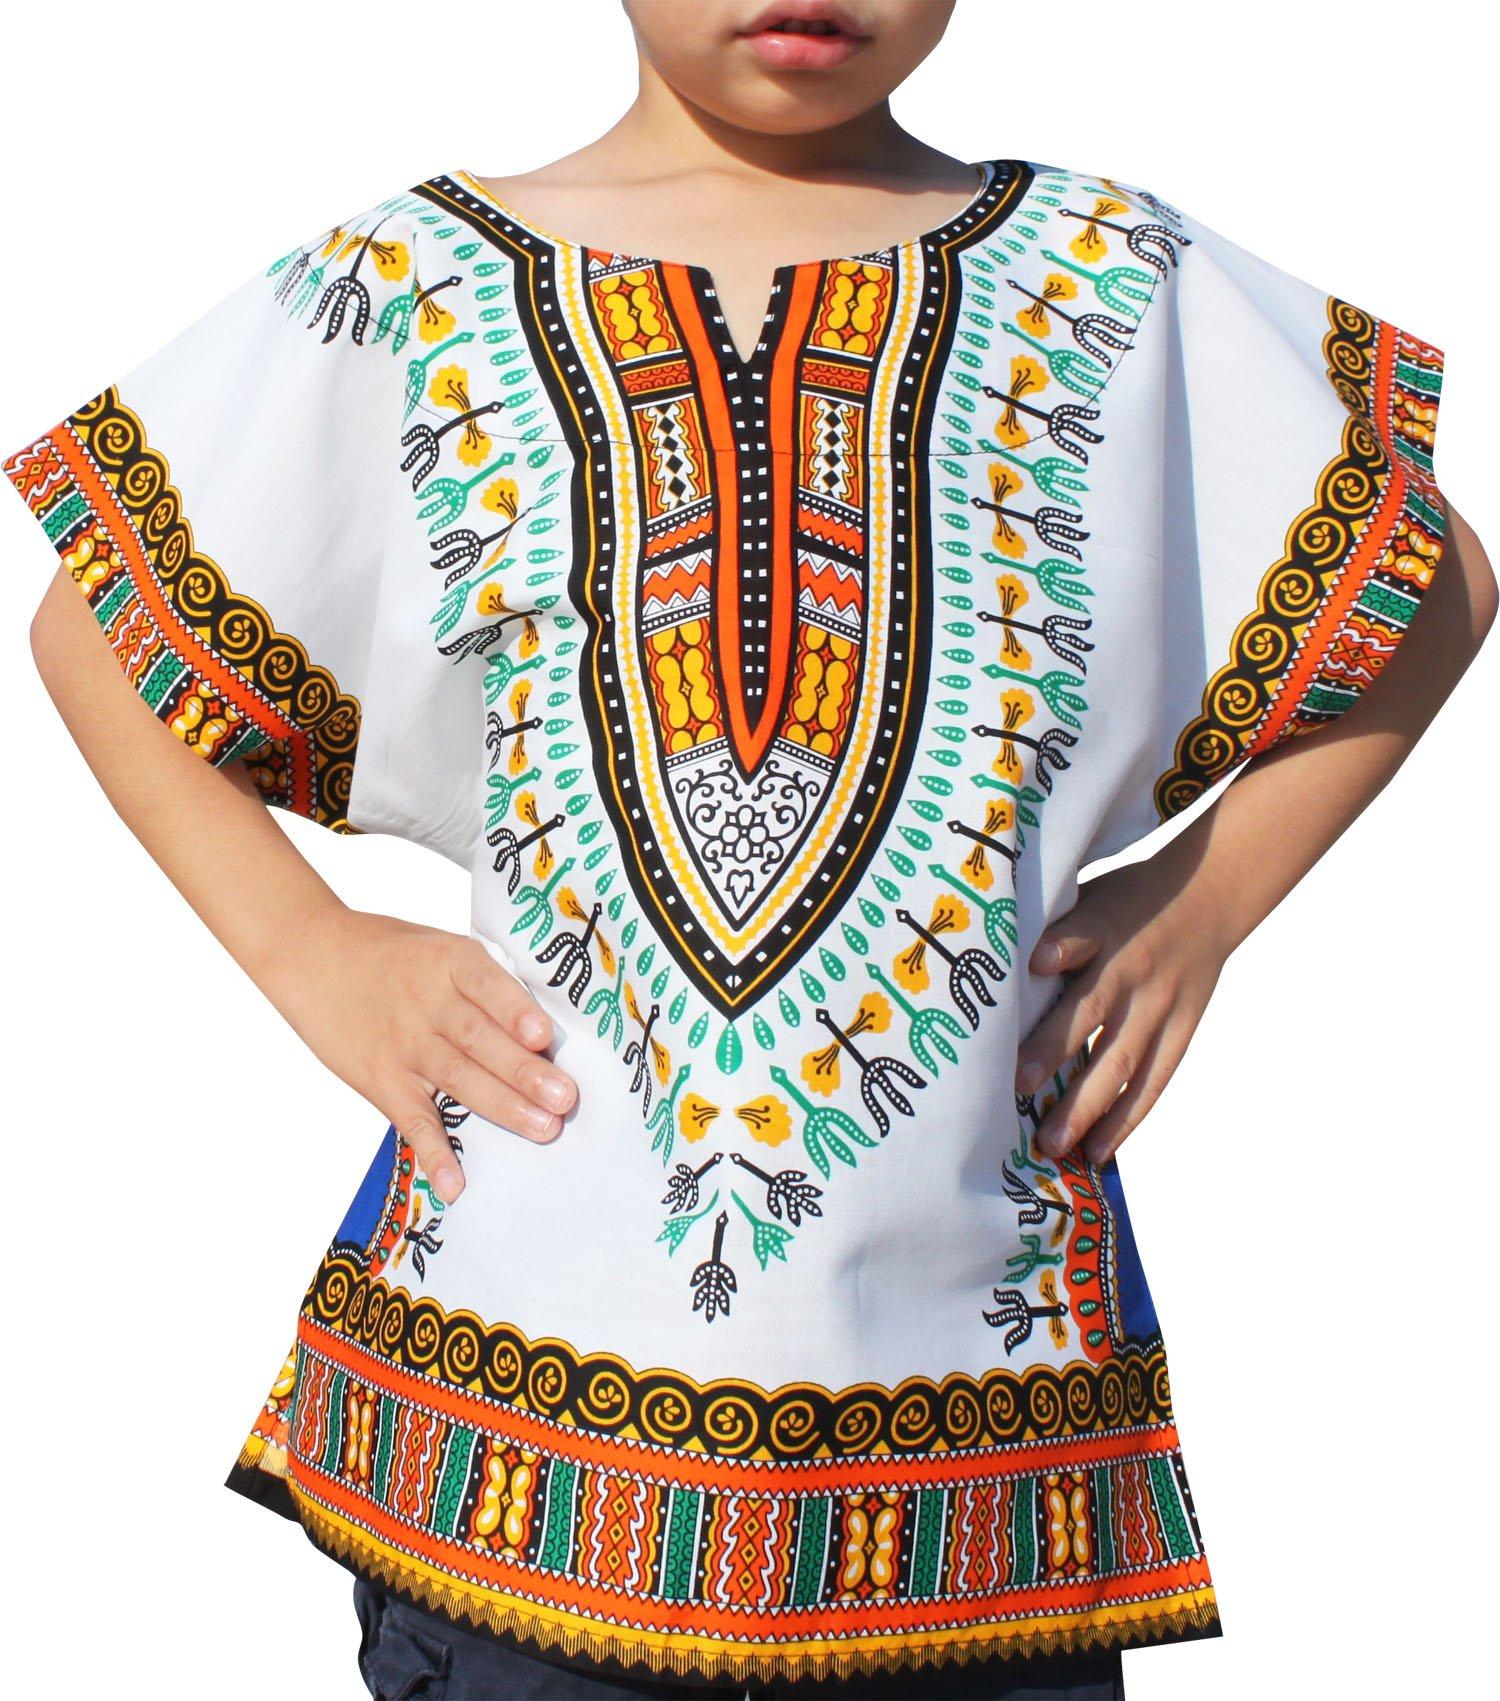 RaanPahMuang Unisex Bright African White Children Dashiki Cotton Shirt, 10-12 Years, Orange White Blue